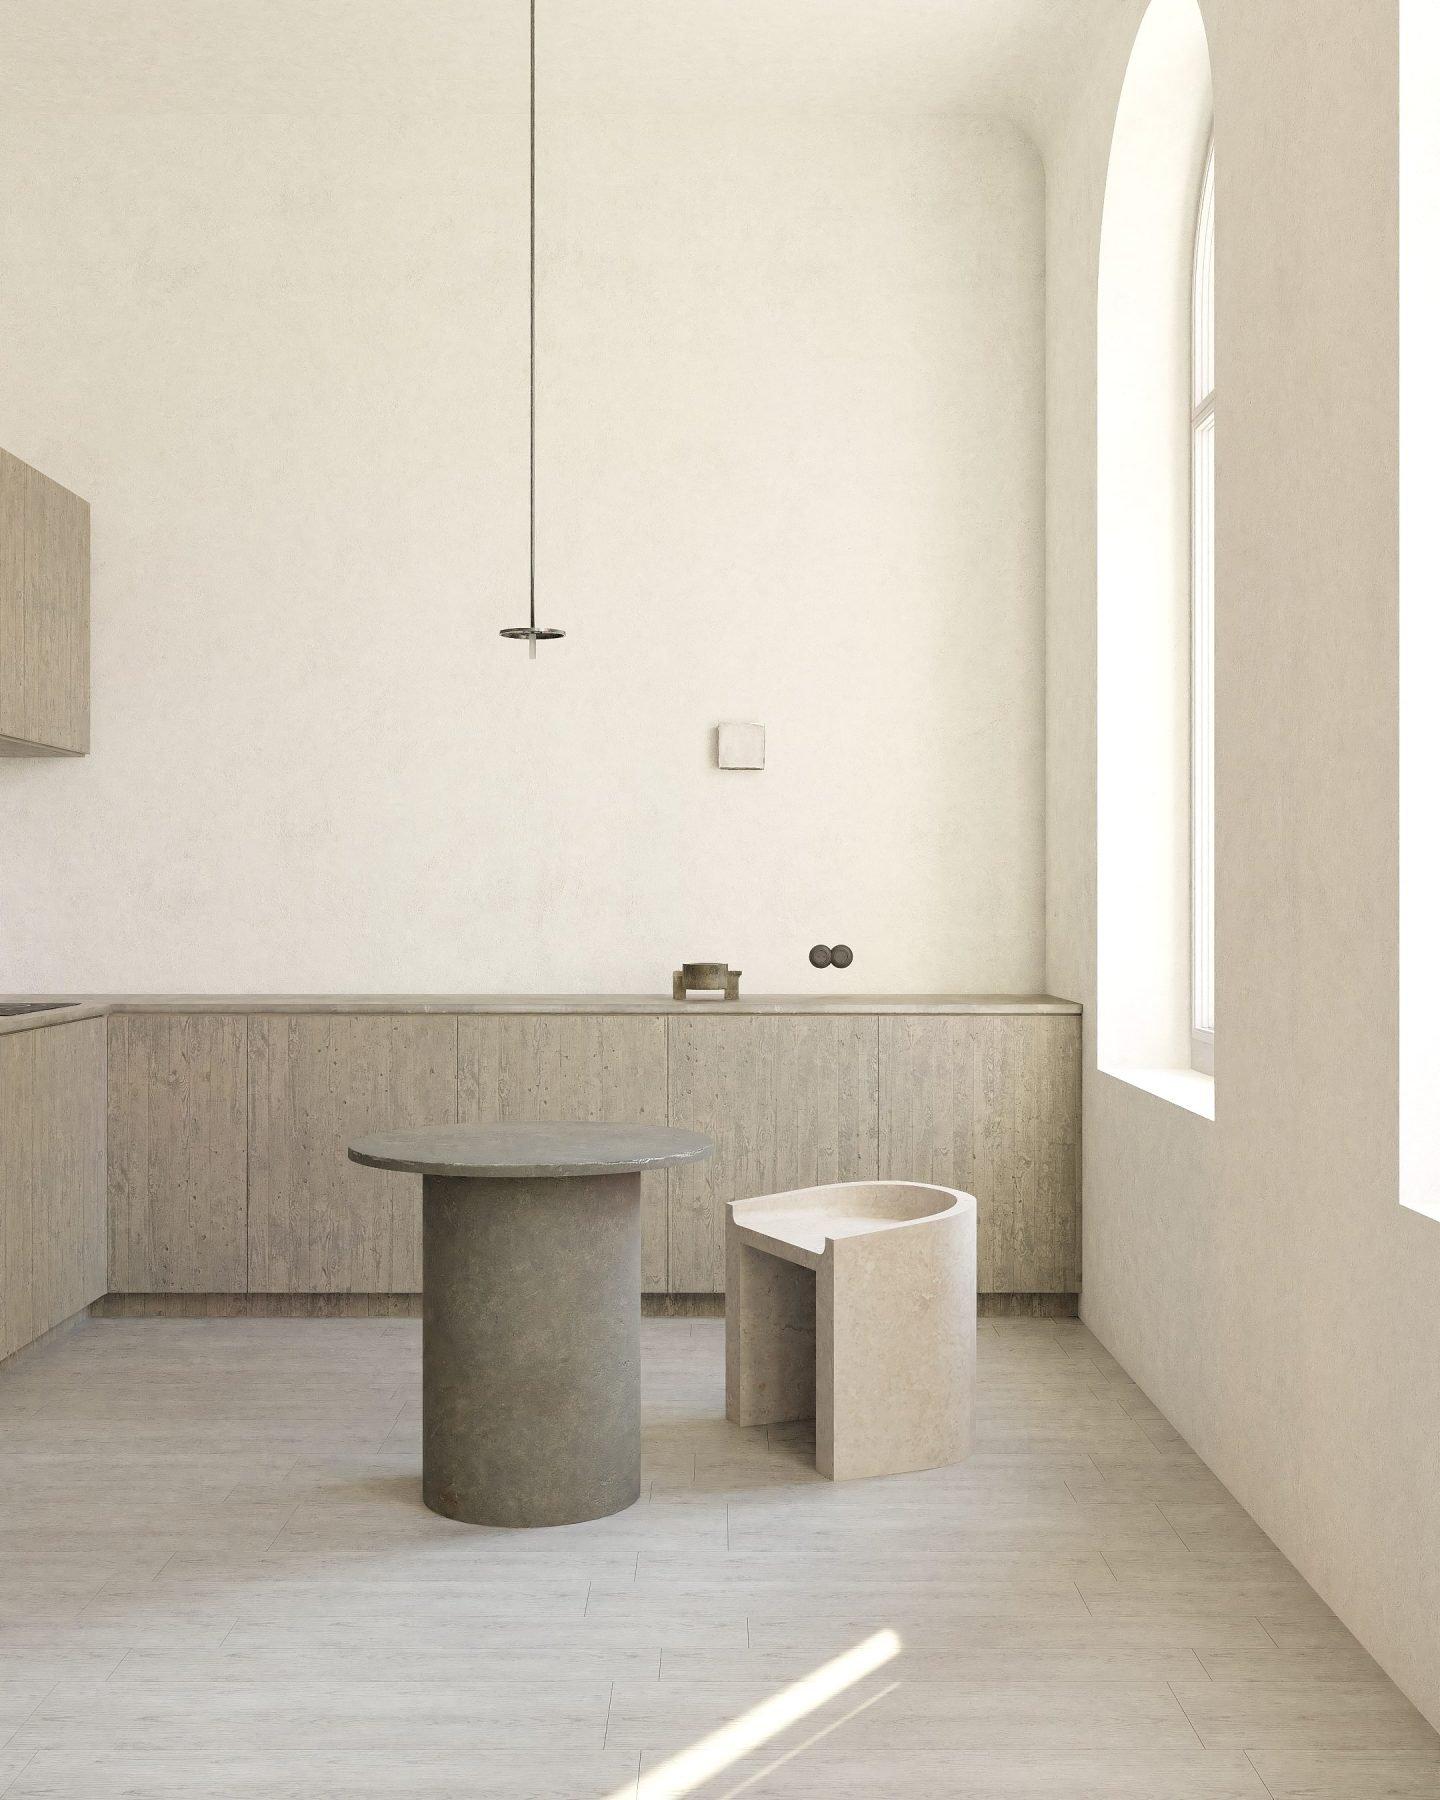 IGNANT-Design-Interview-Osminina-22